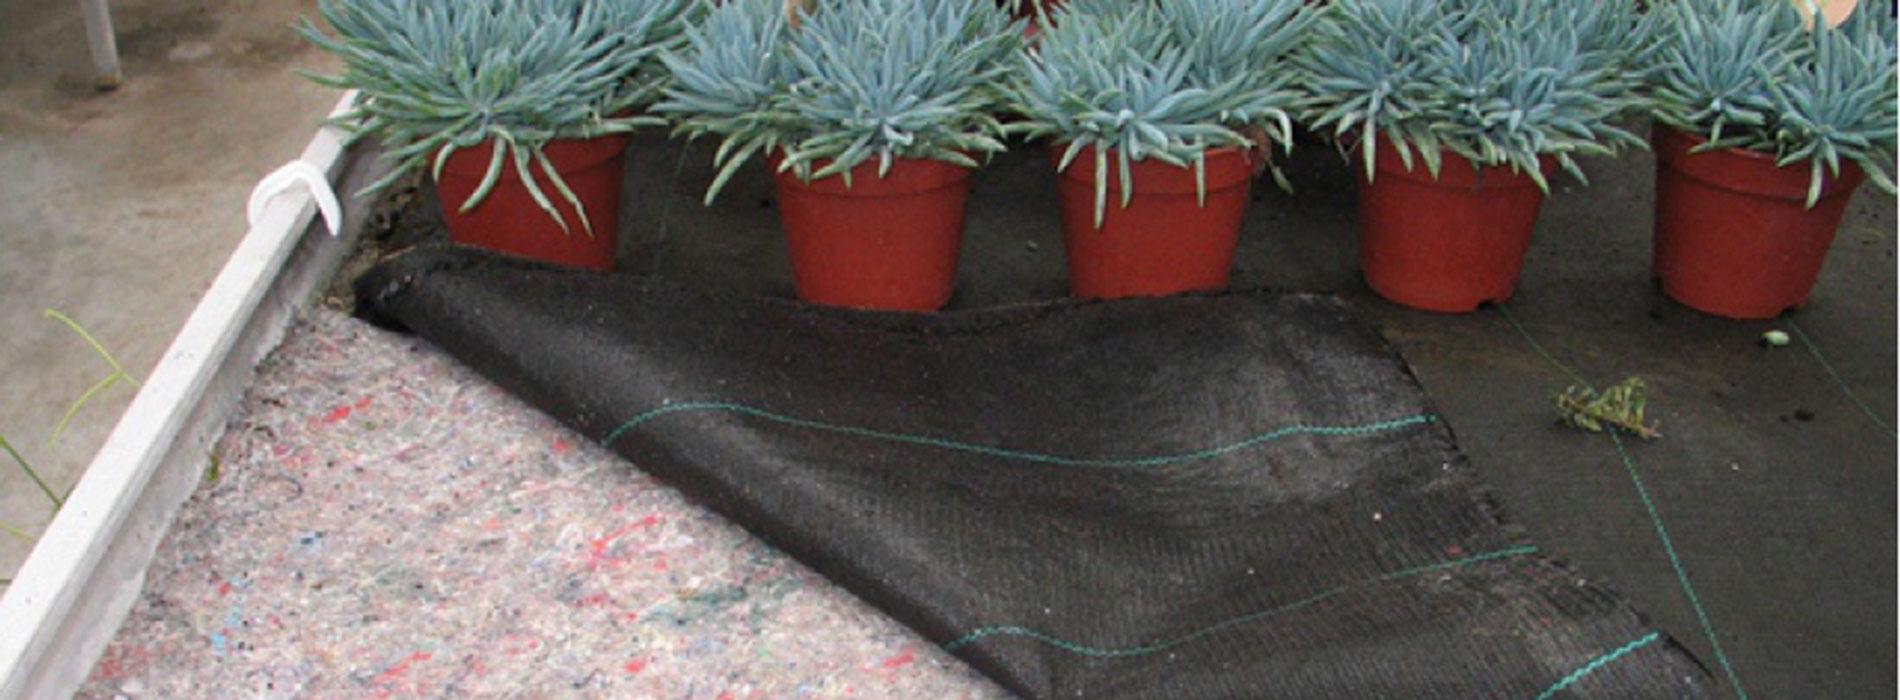 tappeti per sub-irrigazione